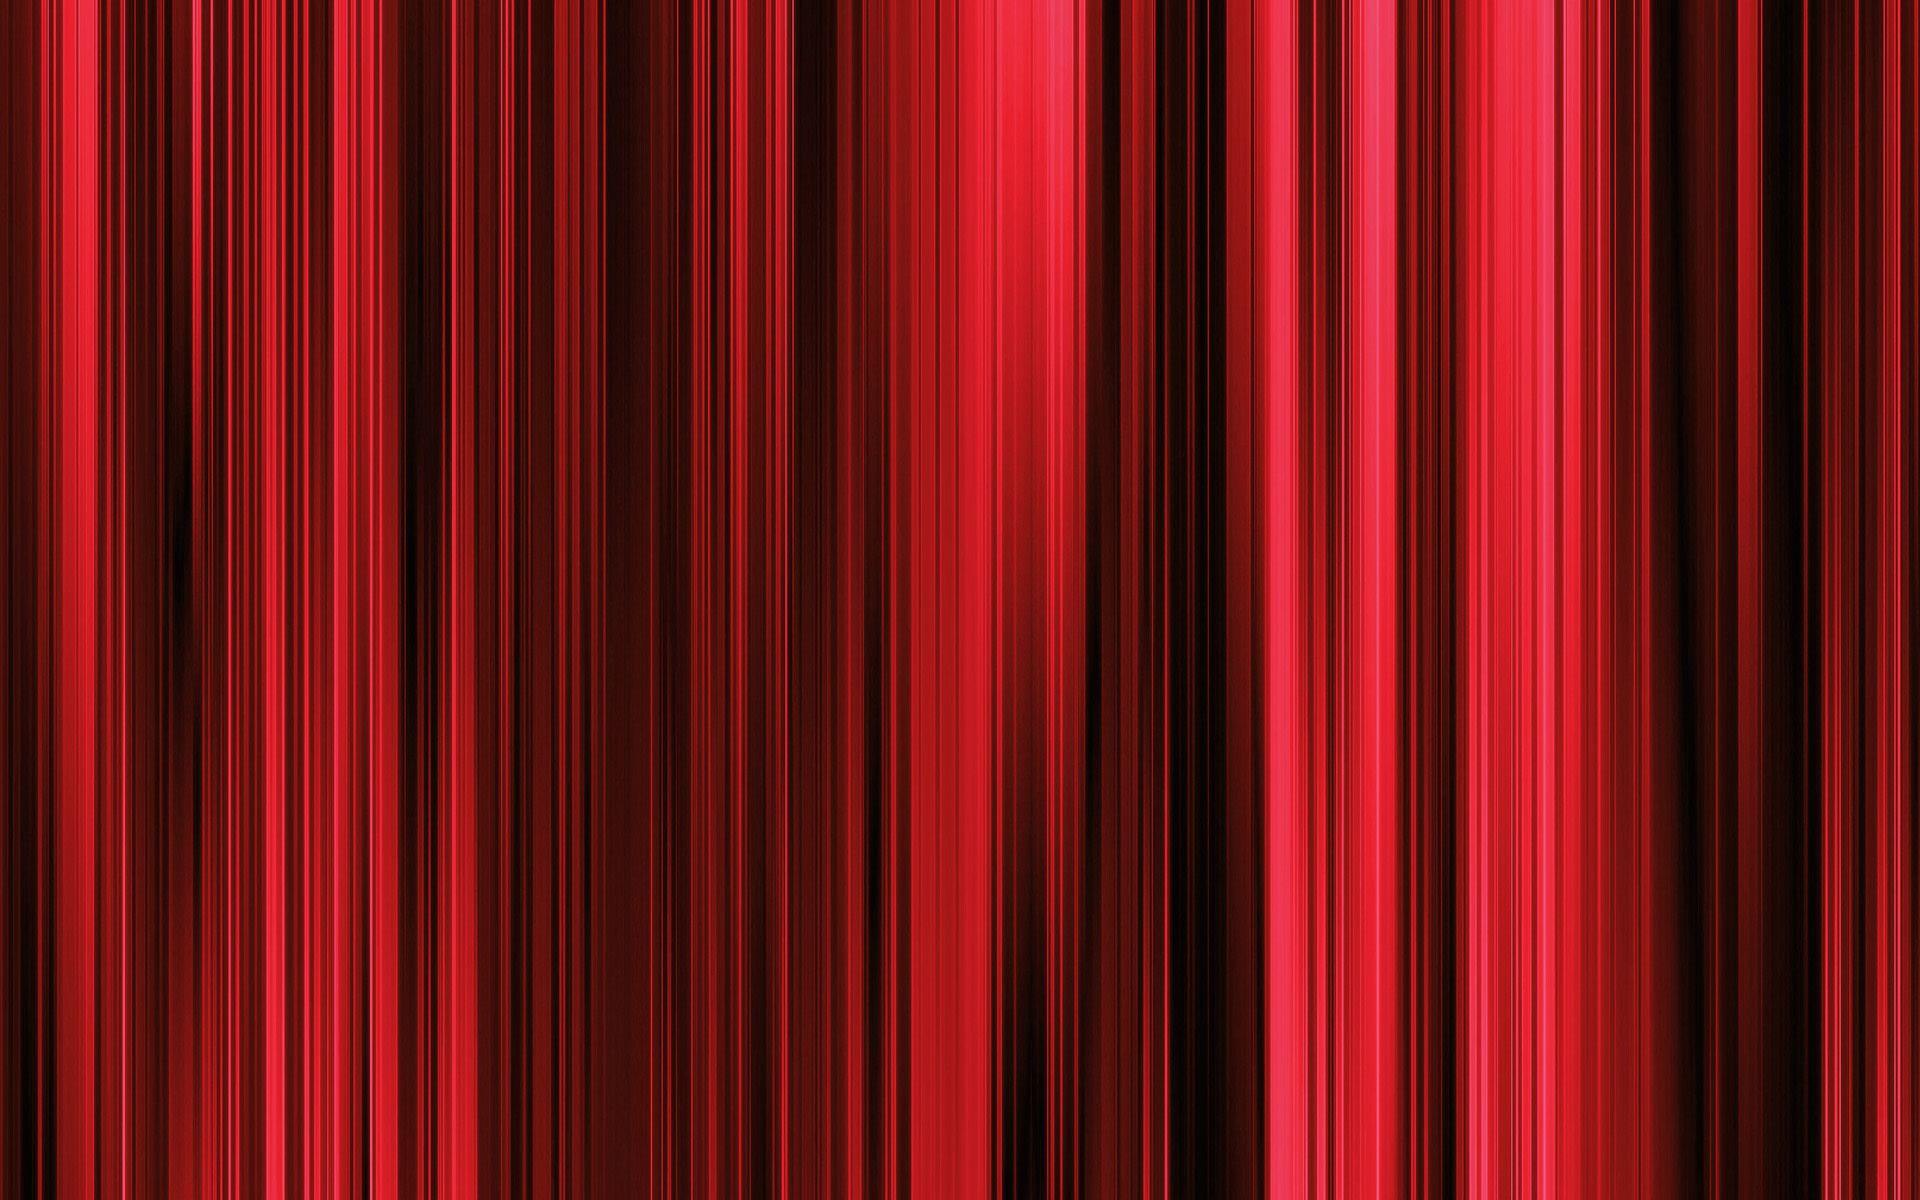 Red Striped 1906459